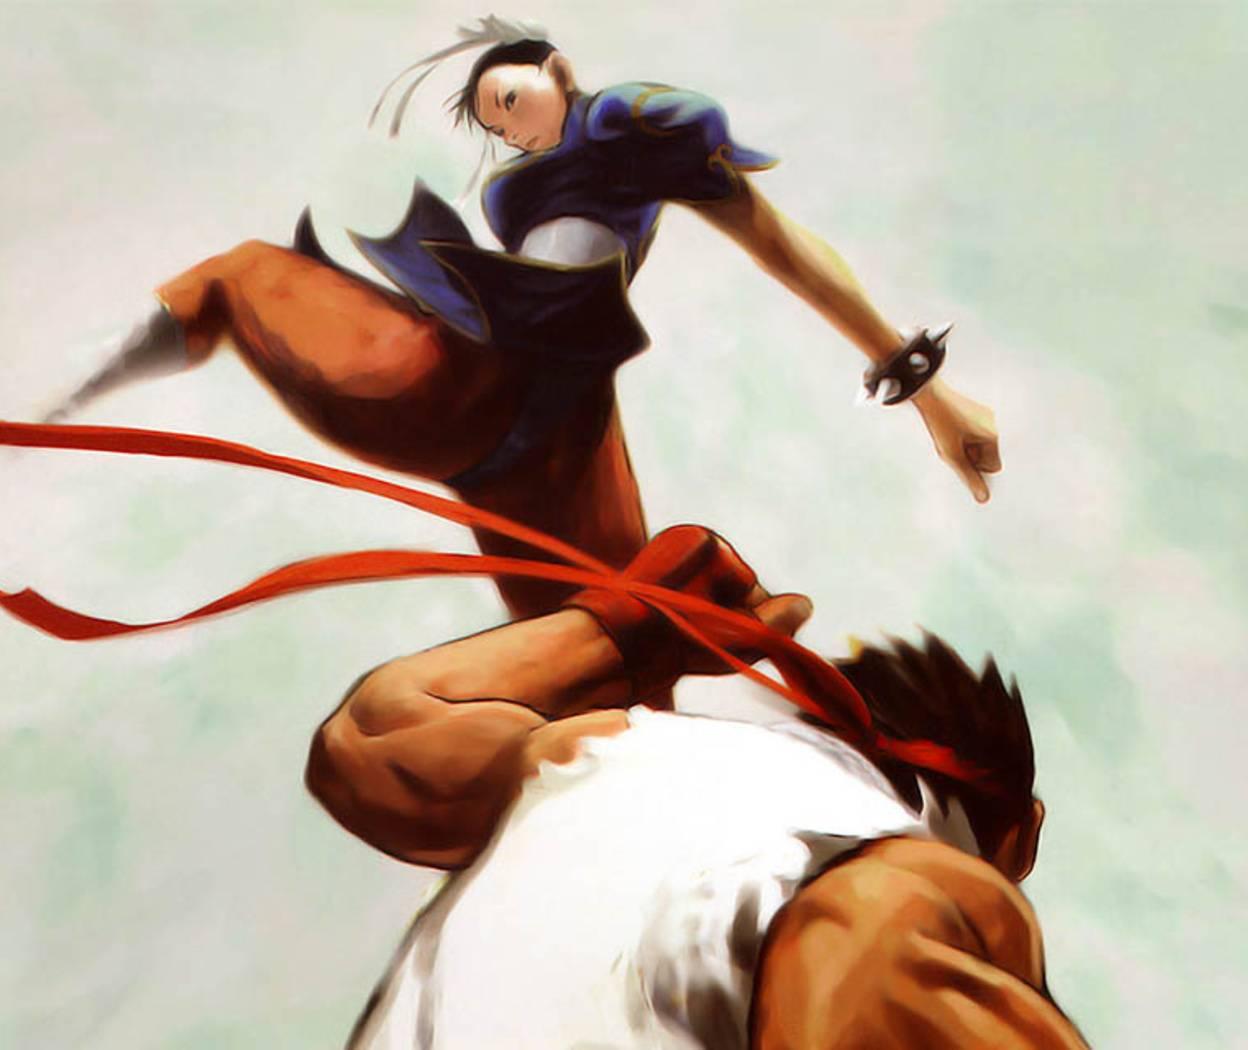 Chun Li Vs Ryu